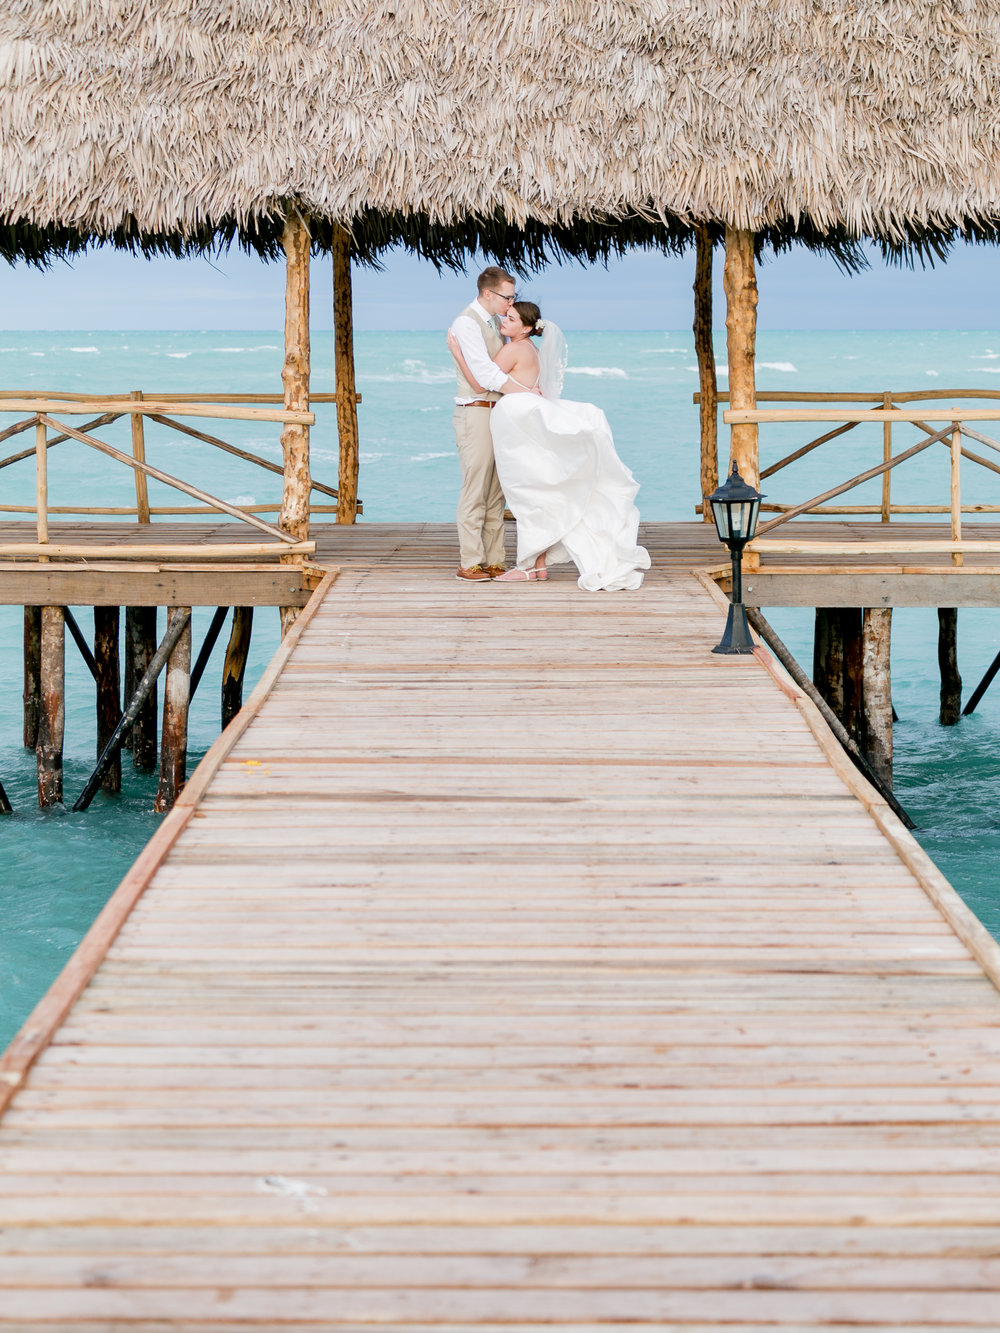 Cayco-Coco-Cuba-Wedding-547.jpg